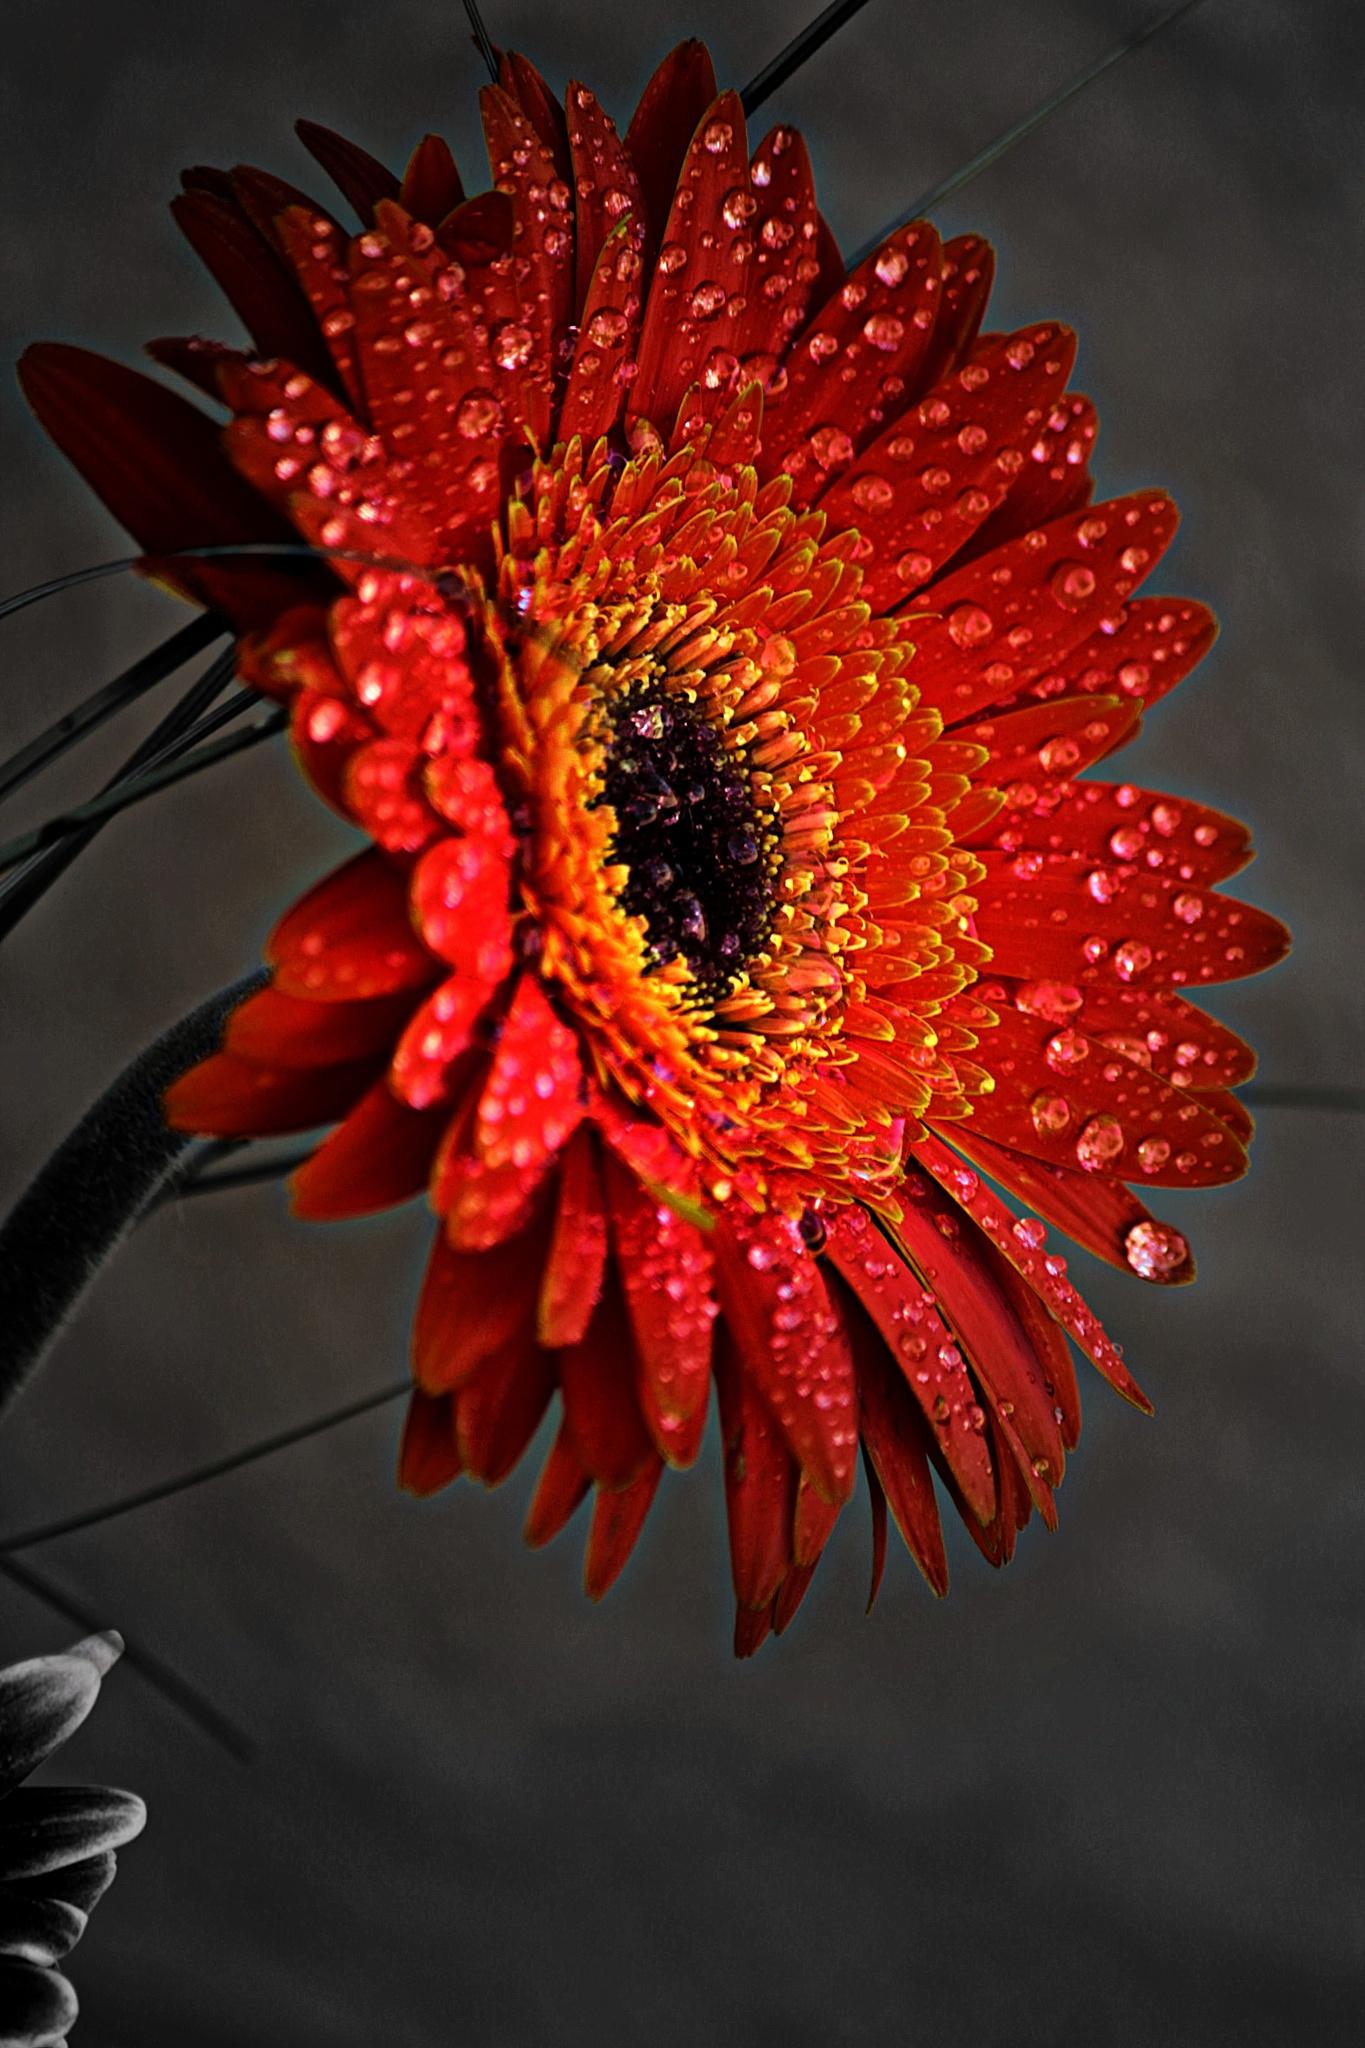 Flower Day-9 by Simon Maxx